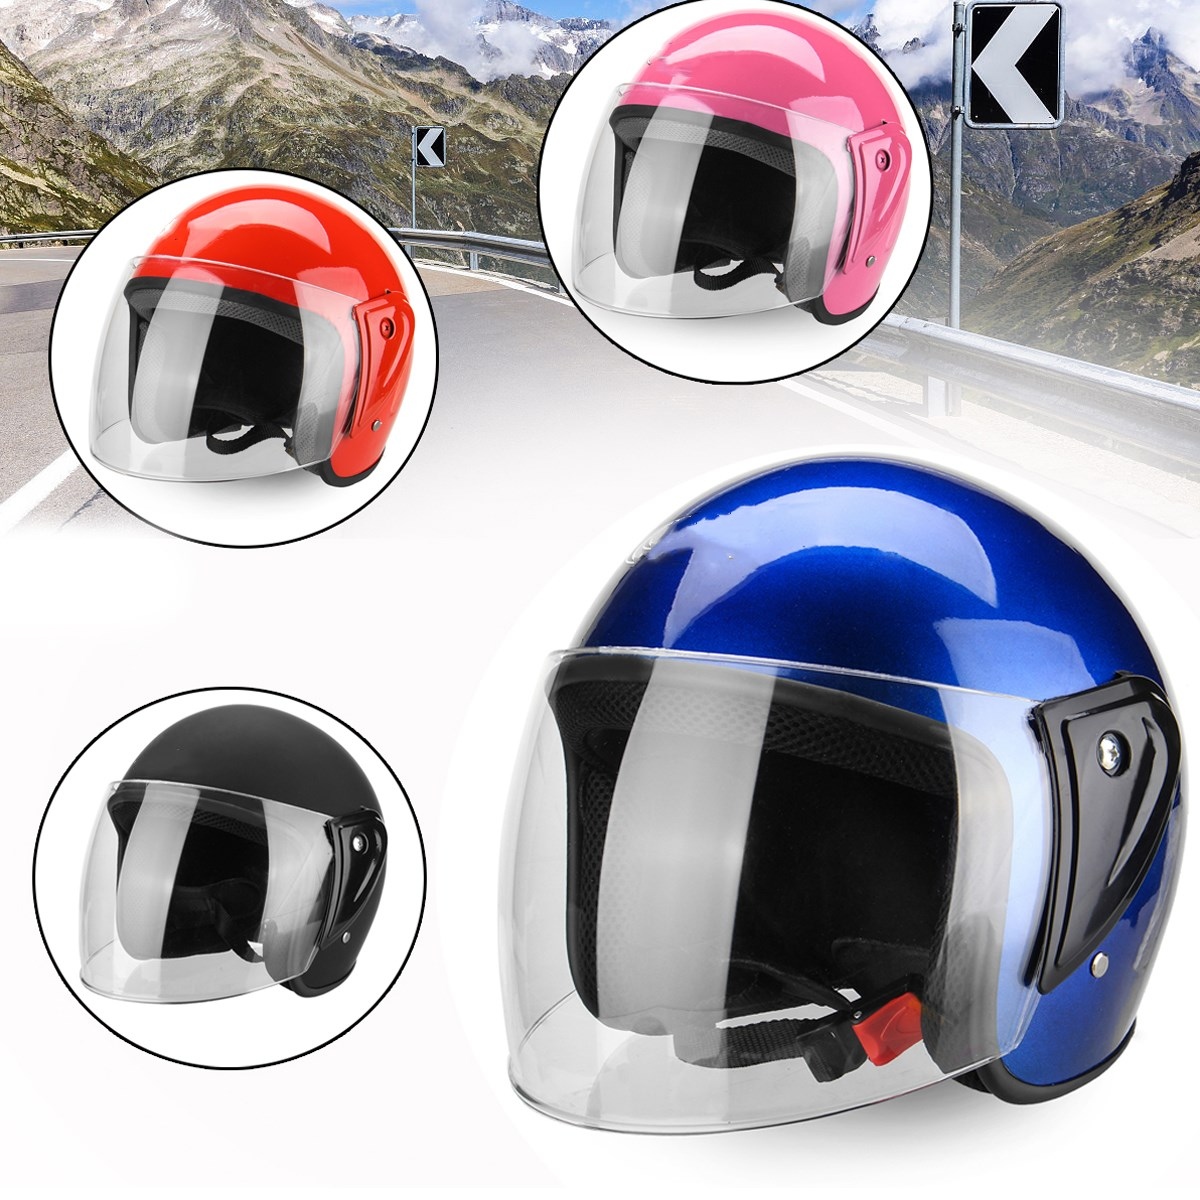 Adjustable Breathable Motorcycle Helmet Vintage Helmets Half Open Face ABS Protective Gear Unisex Motorbike Moto Bike Helmet